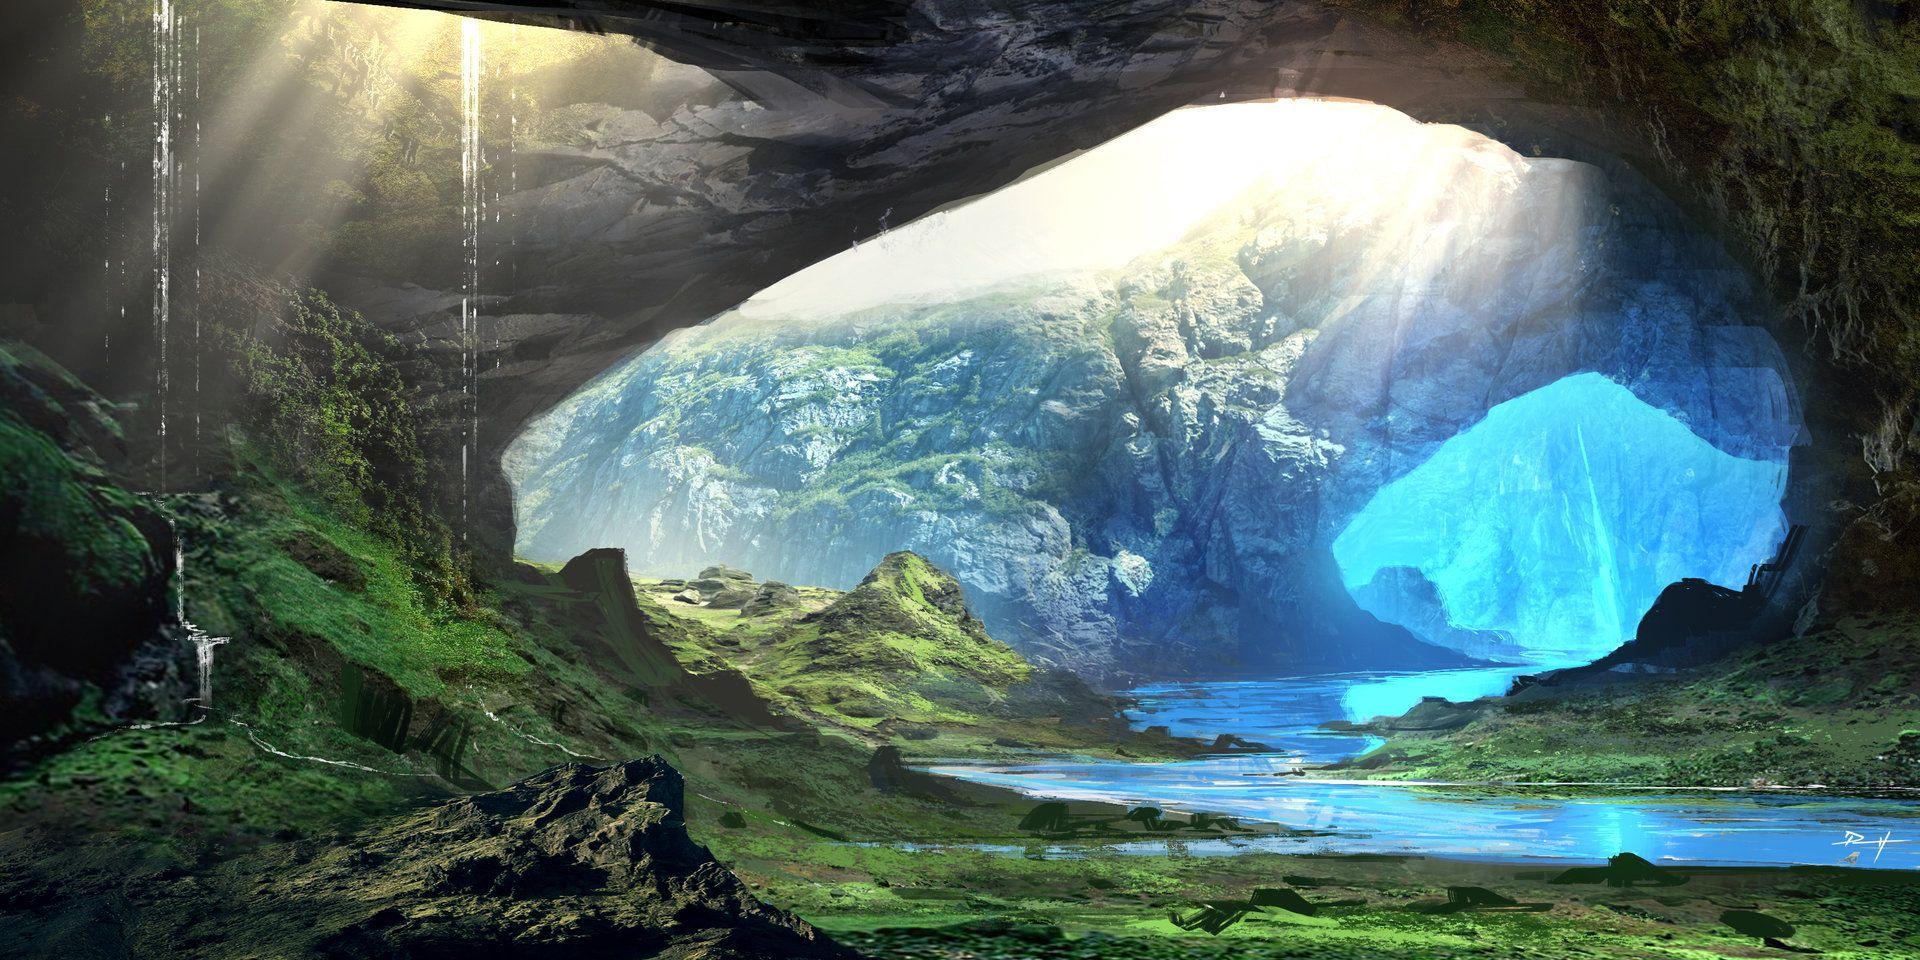 ArtStation - 'Crystal Caverns', Daniel Pellow